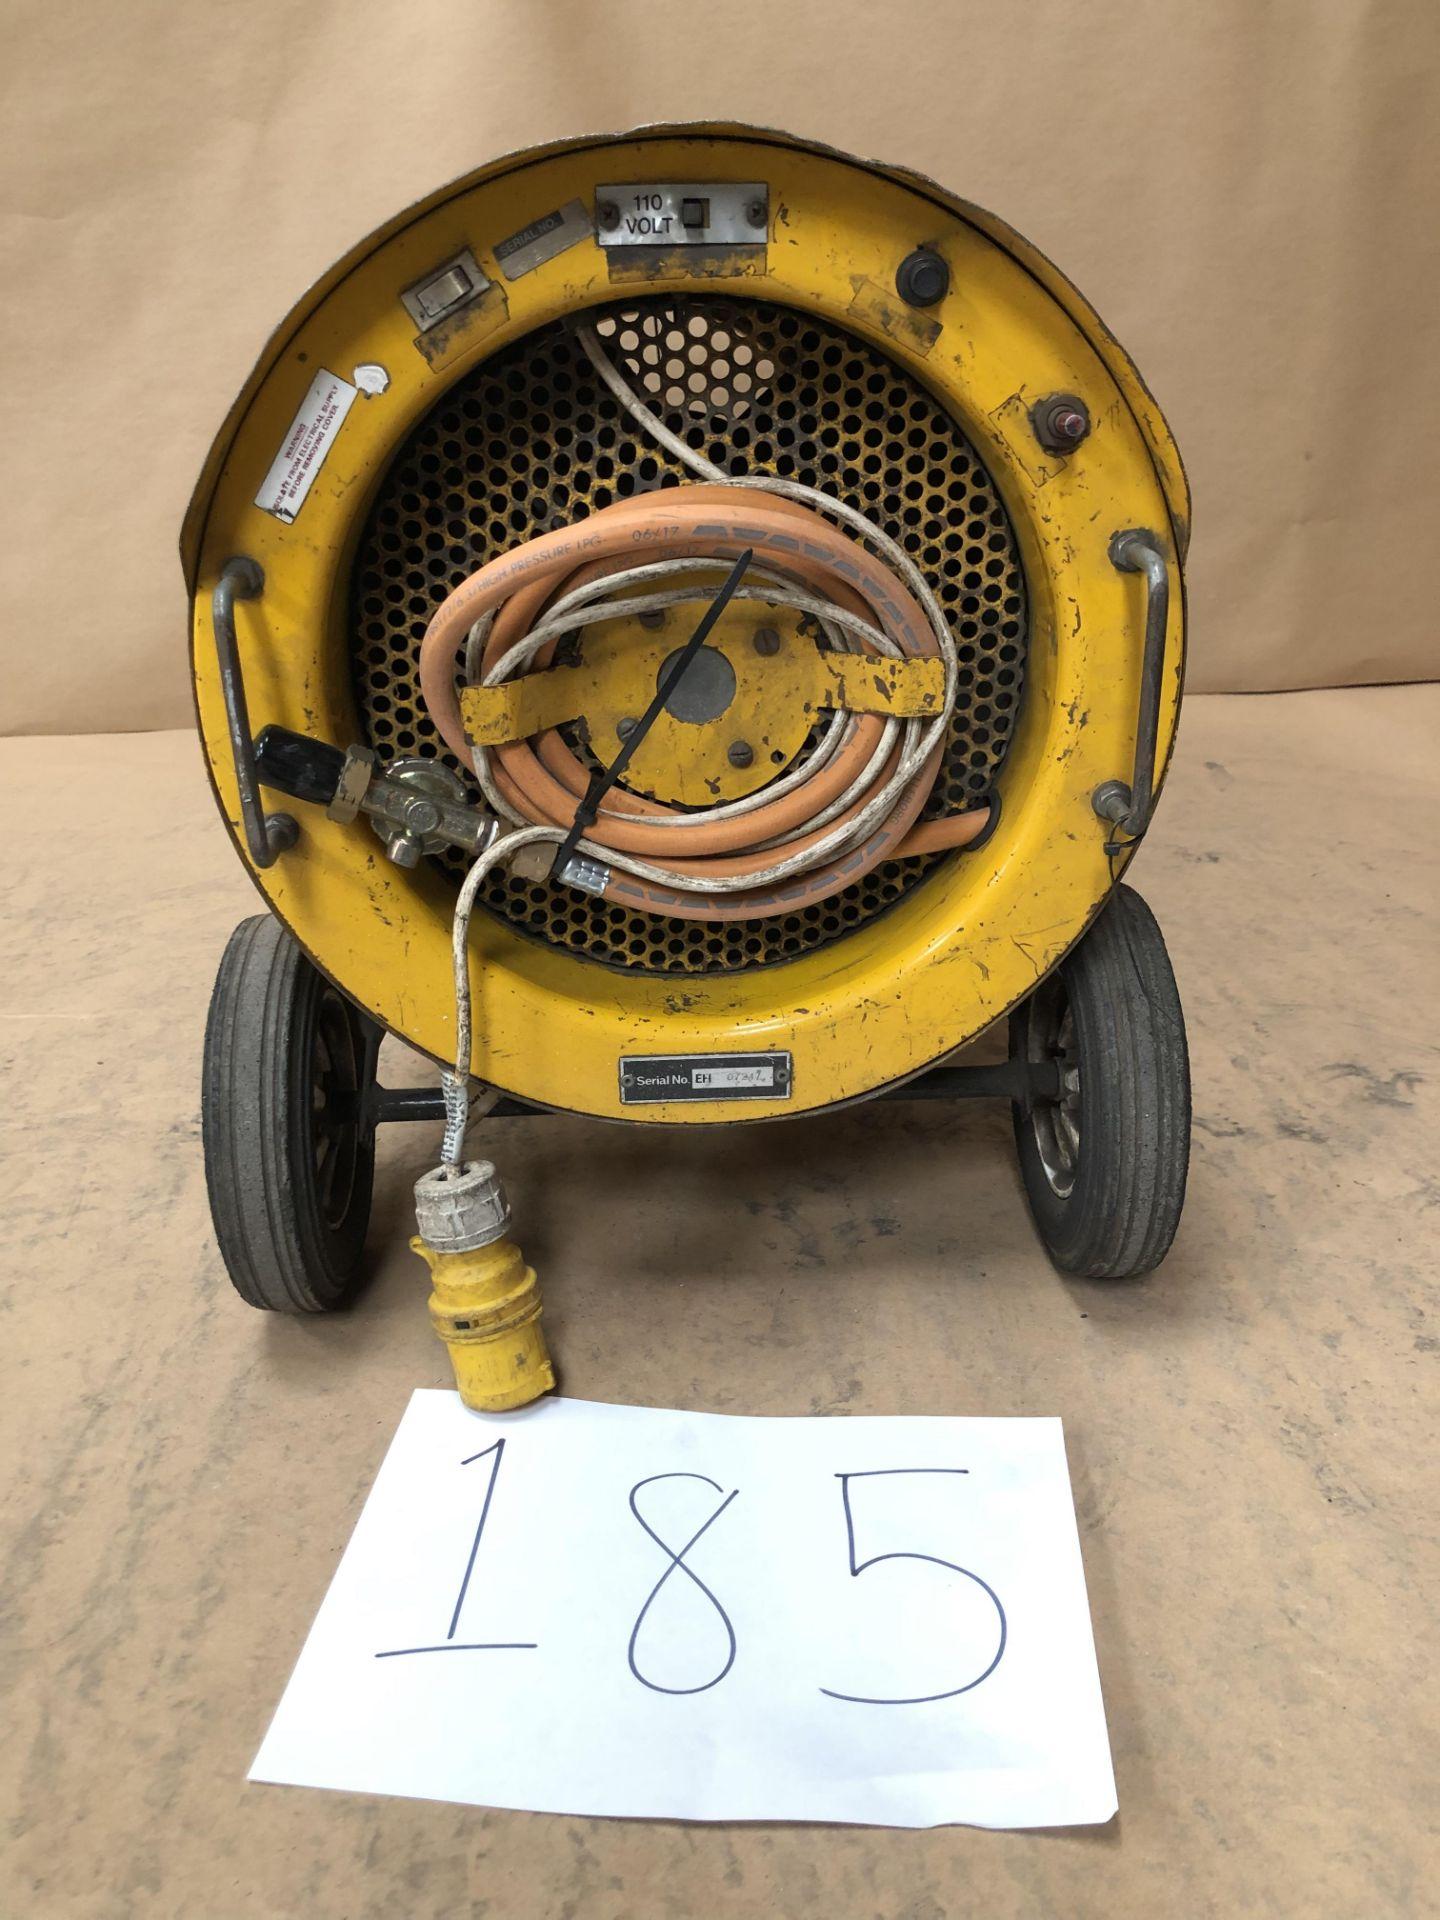 Easyheater 275 Propane Heater - Image 3 of 3